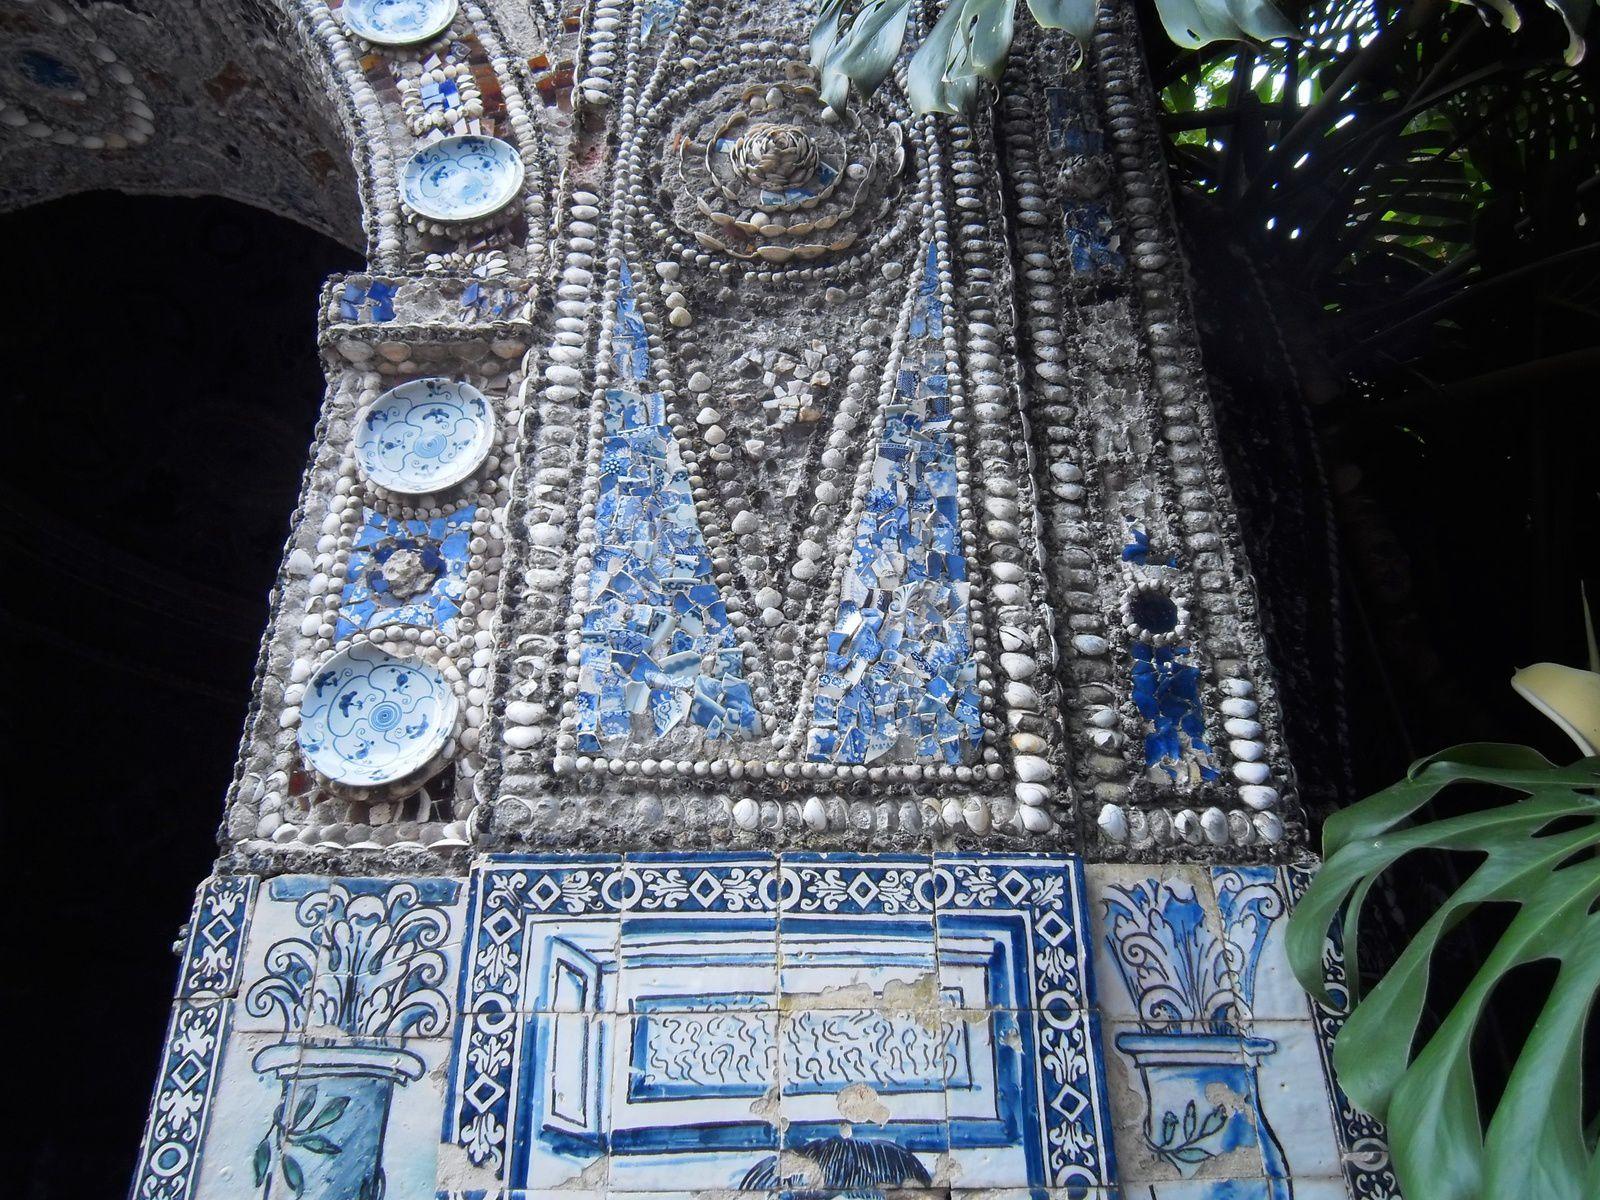 Palácio Fronteira - Lisbonne